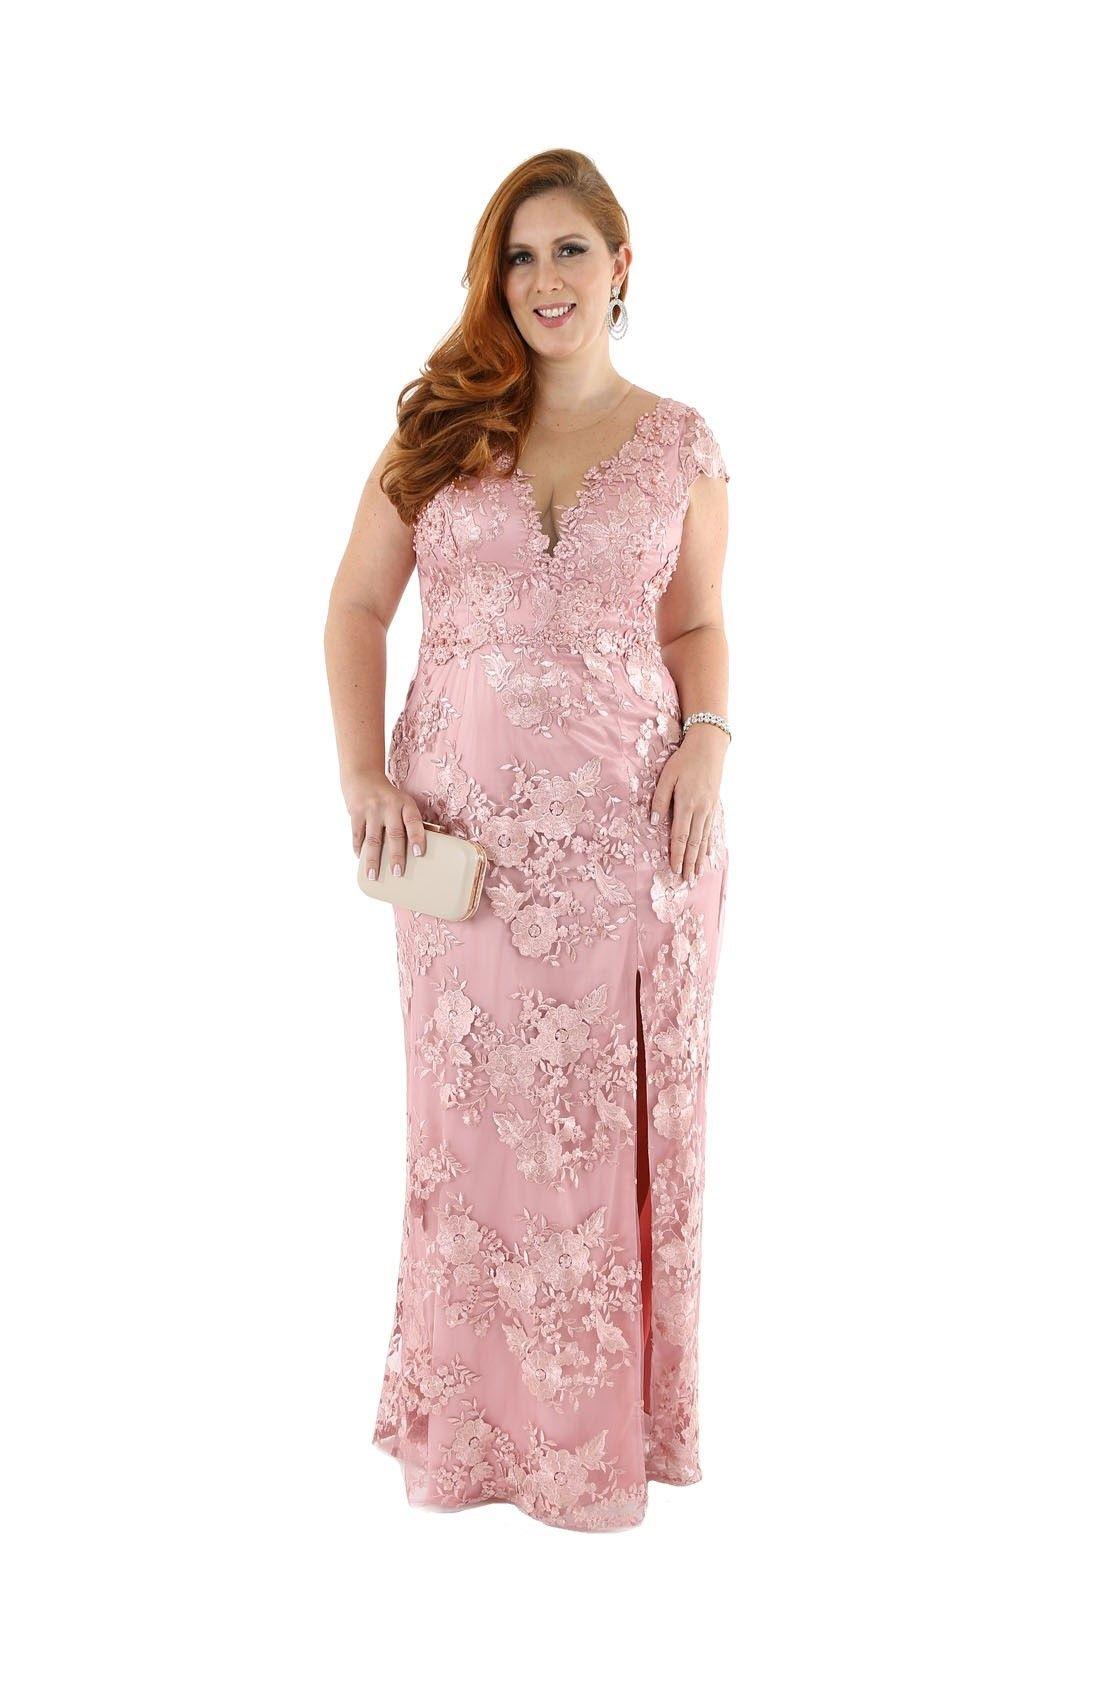 bb9d5872e Vestido de Festa Plus Size em Renda com Fenda » Plus Size